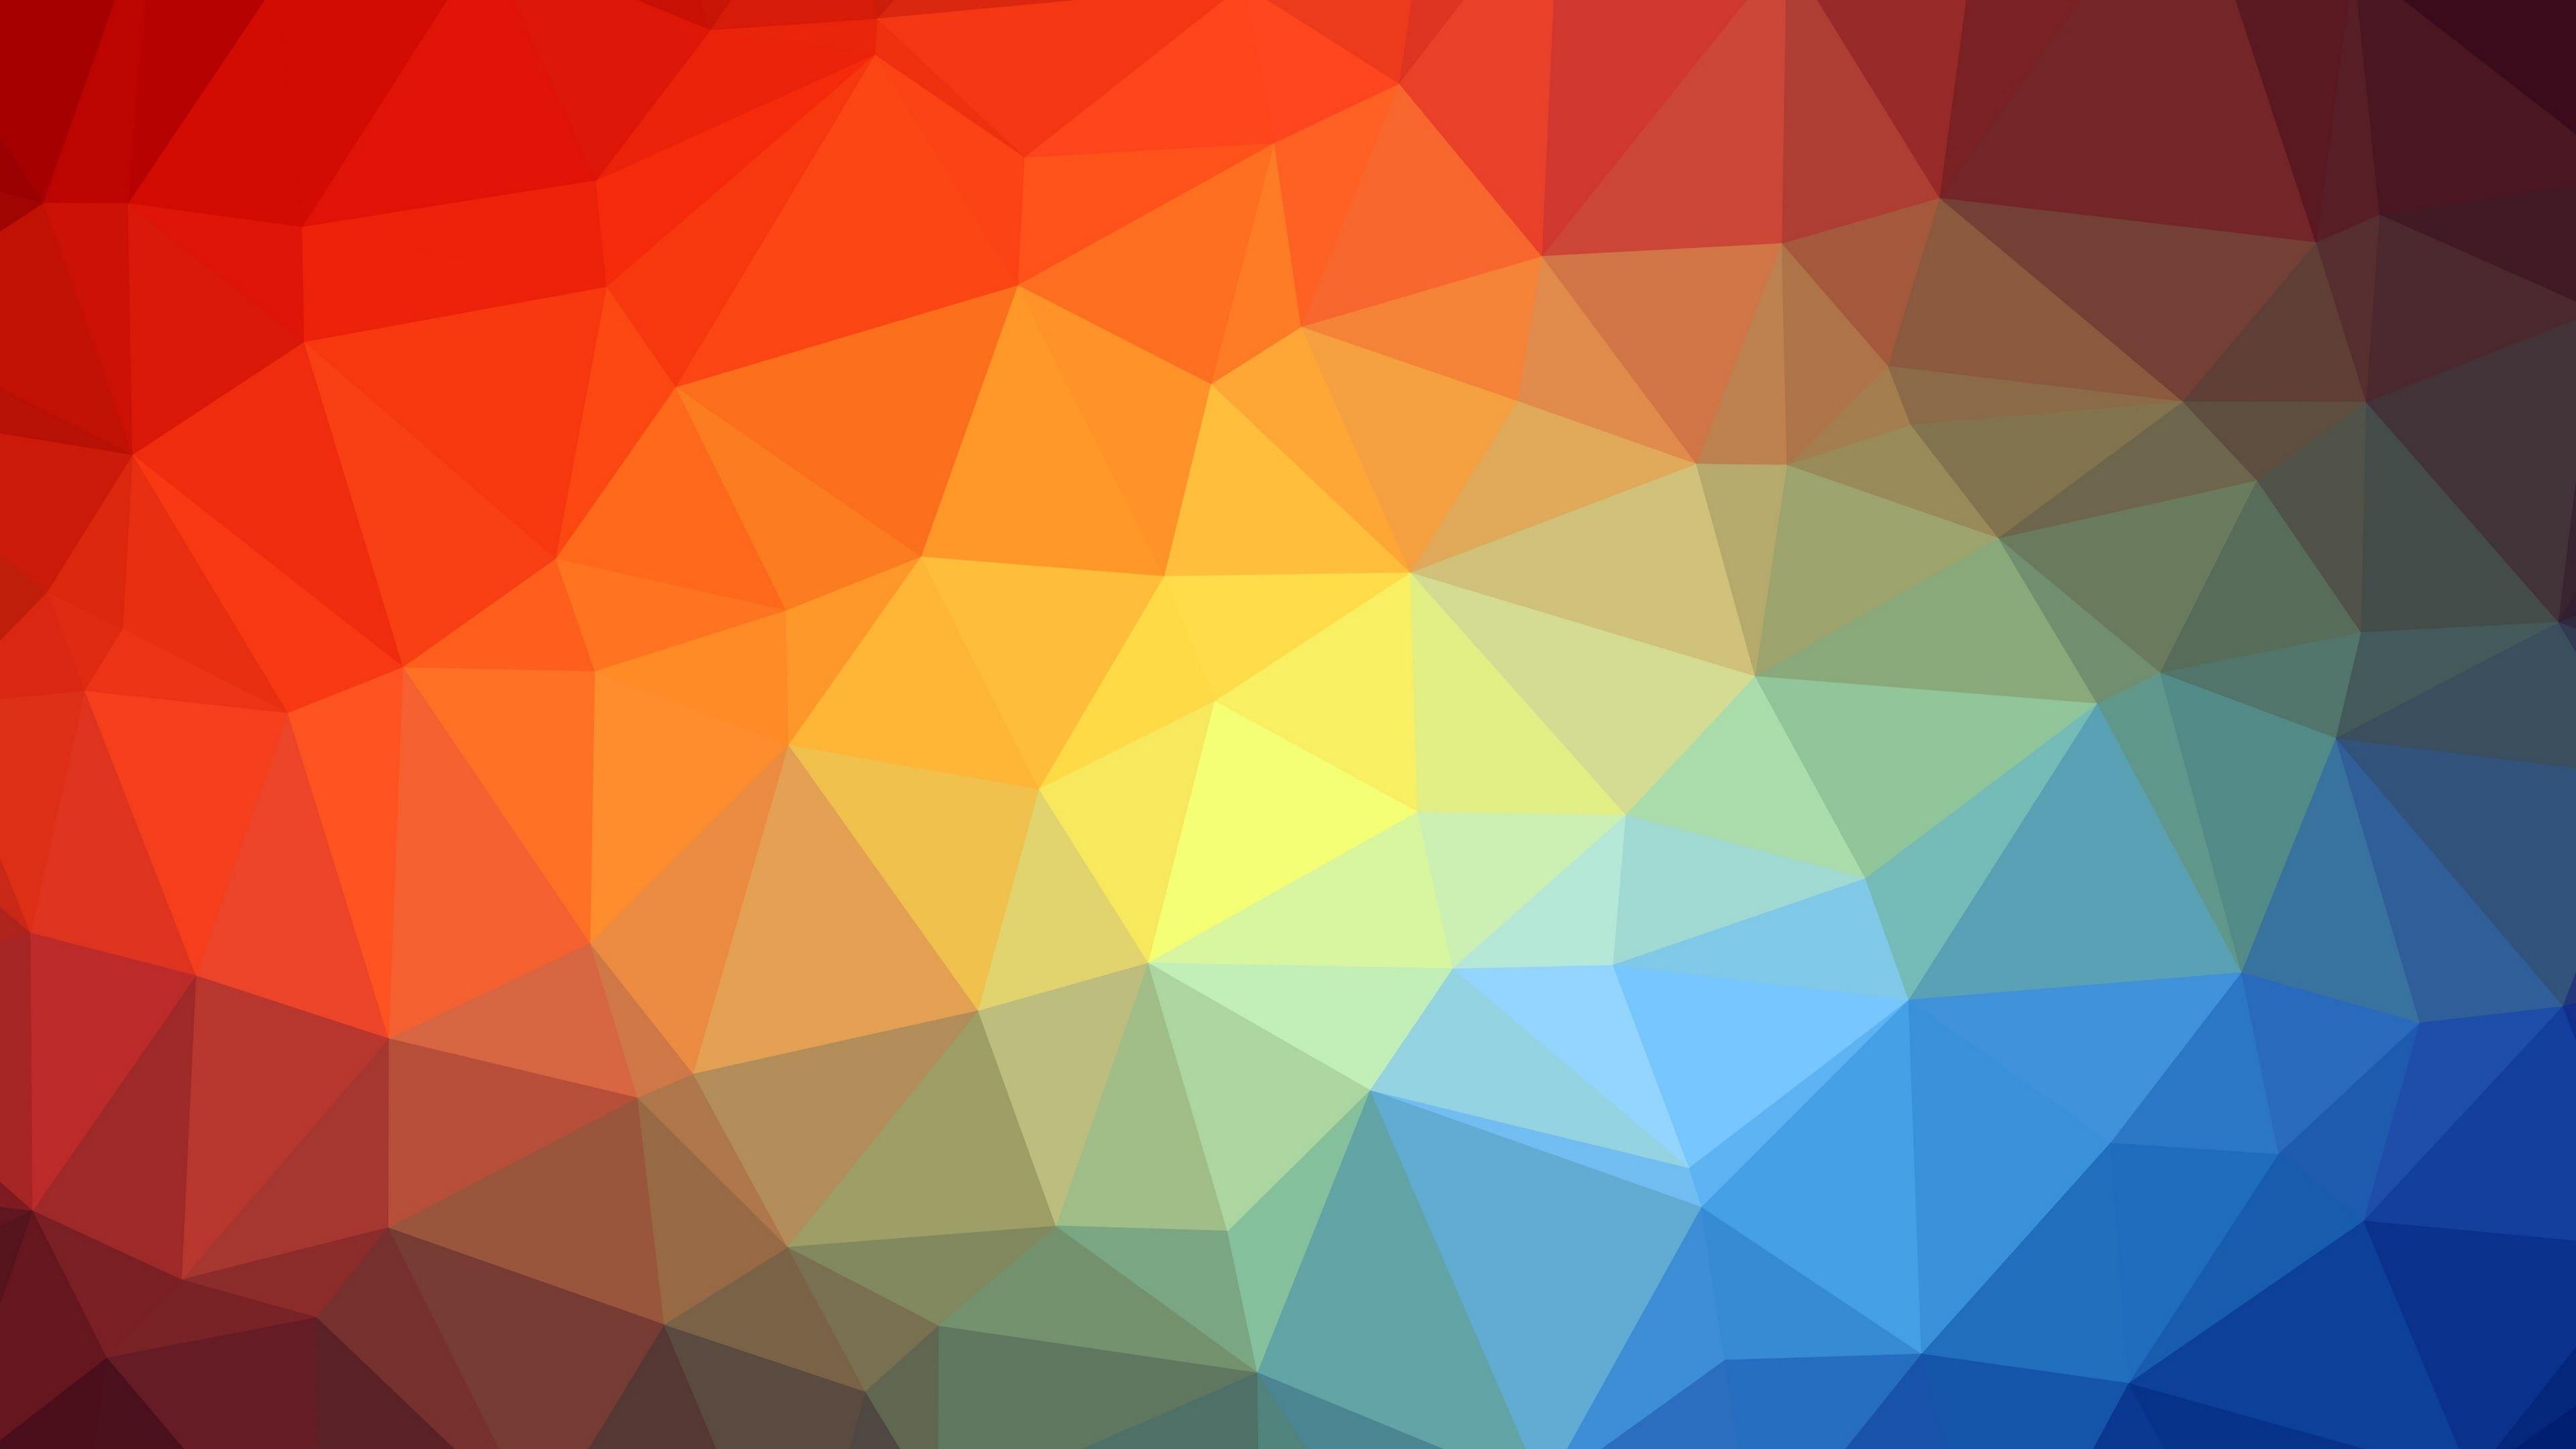 Polygon Geometric Multicolor Colorful 3d Pattern Triangle Graphics 4k Wallpaper Hdwallpaper Desktop In 2021 Abstract Geometric Wallpaper 4k Geometric Geometric desktop wallpaper 4k